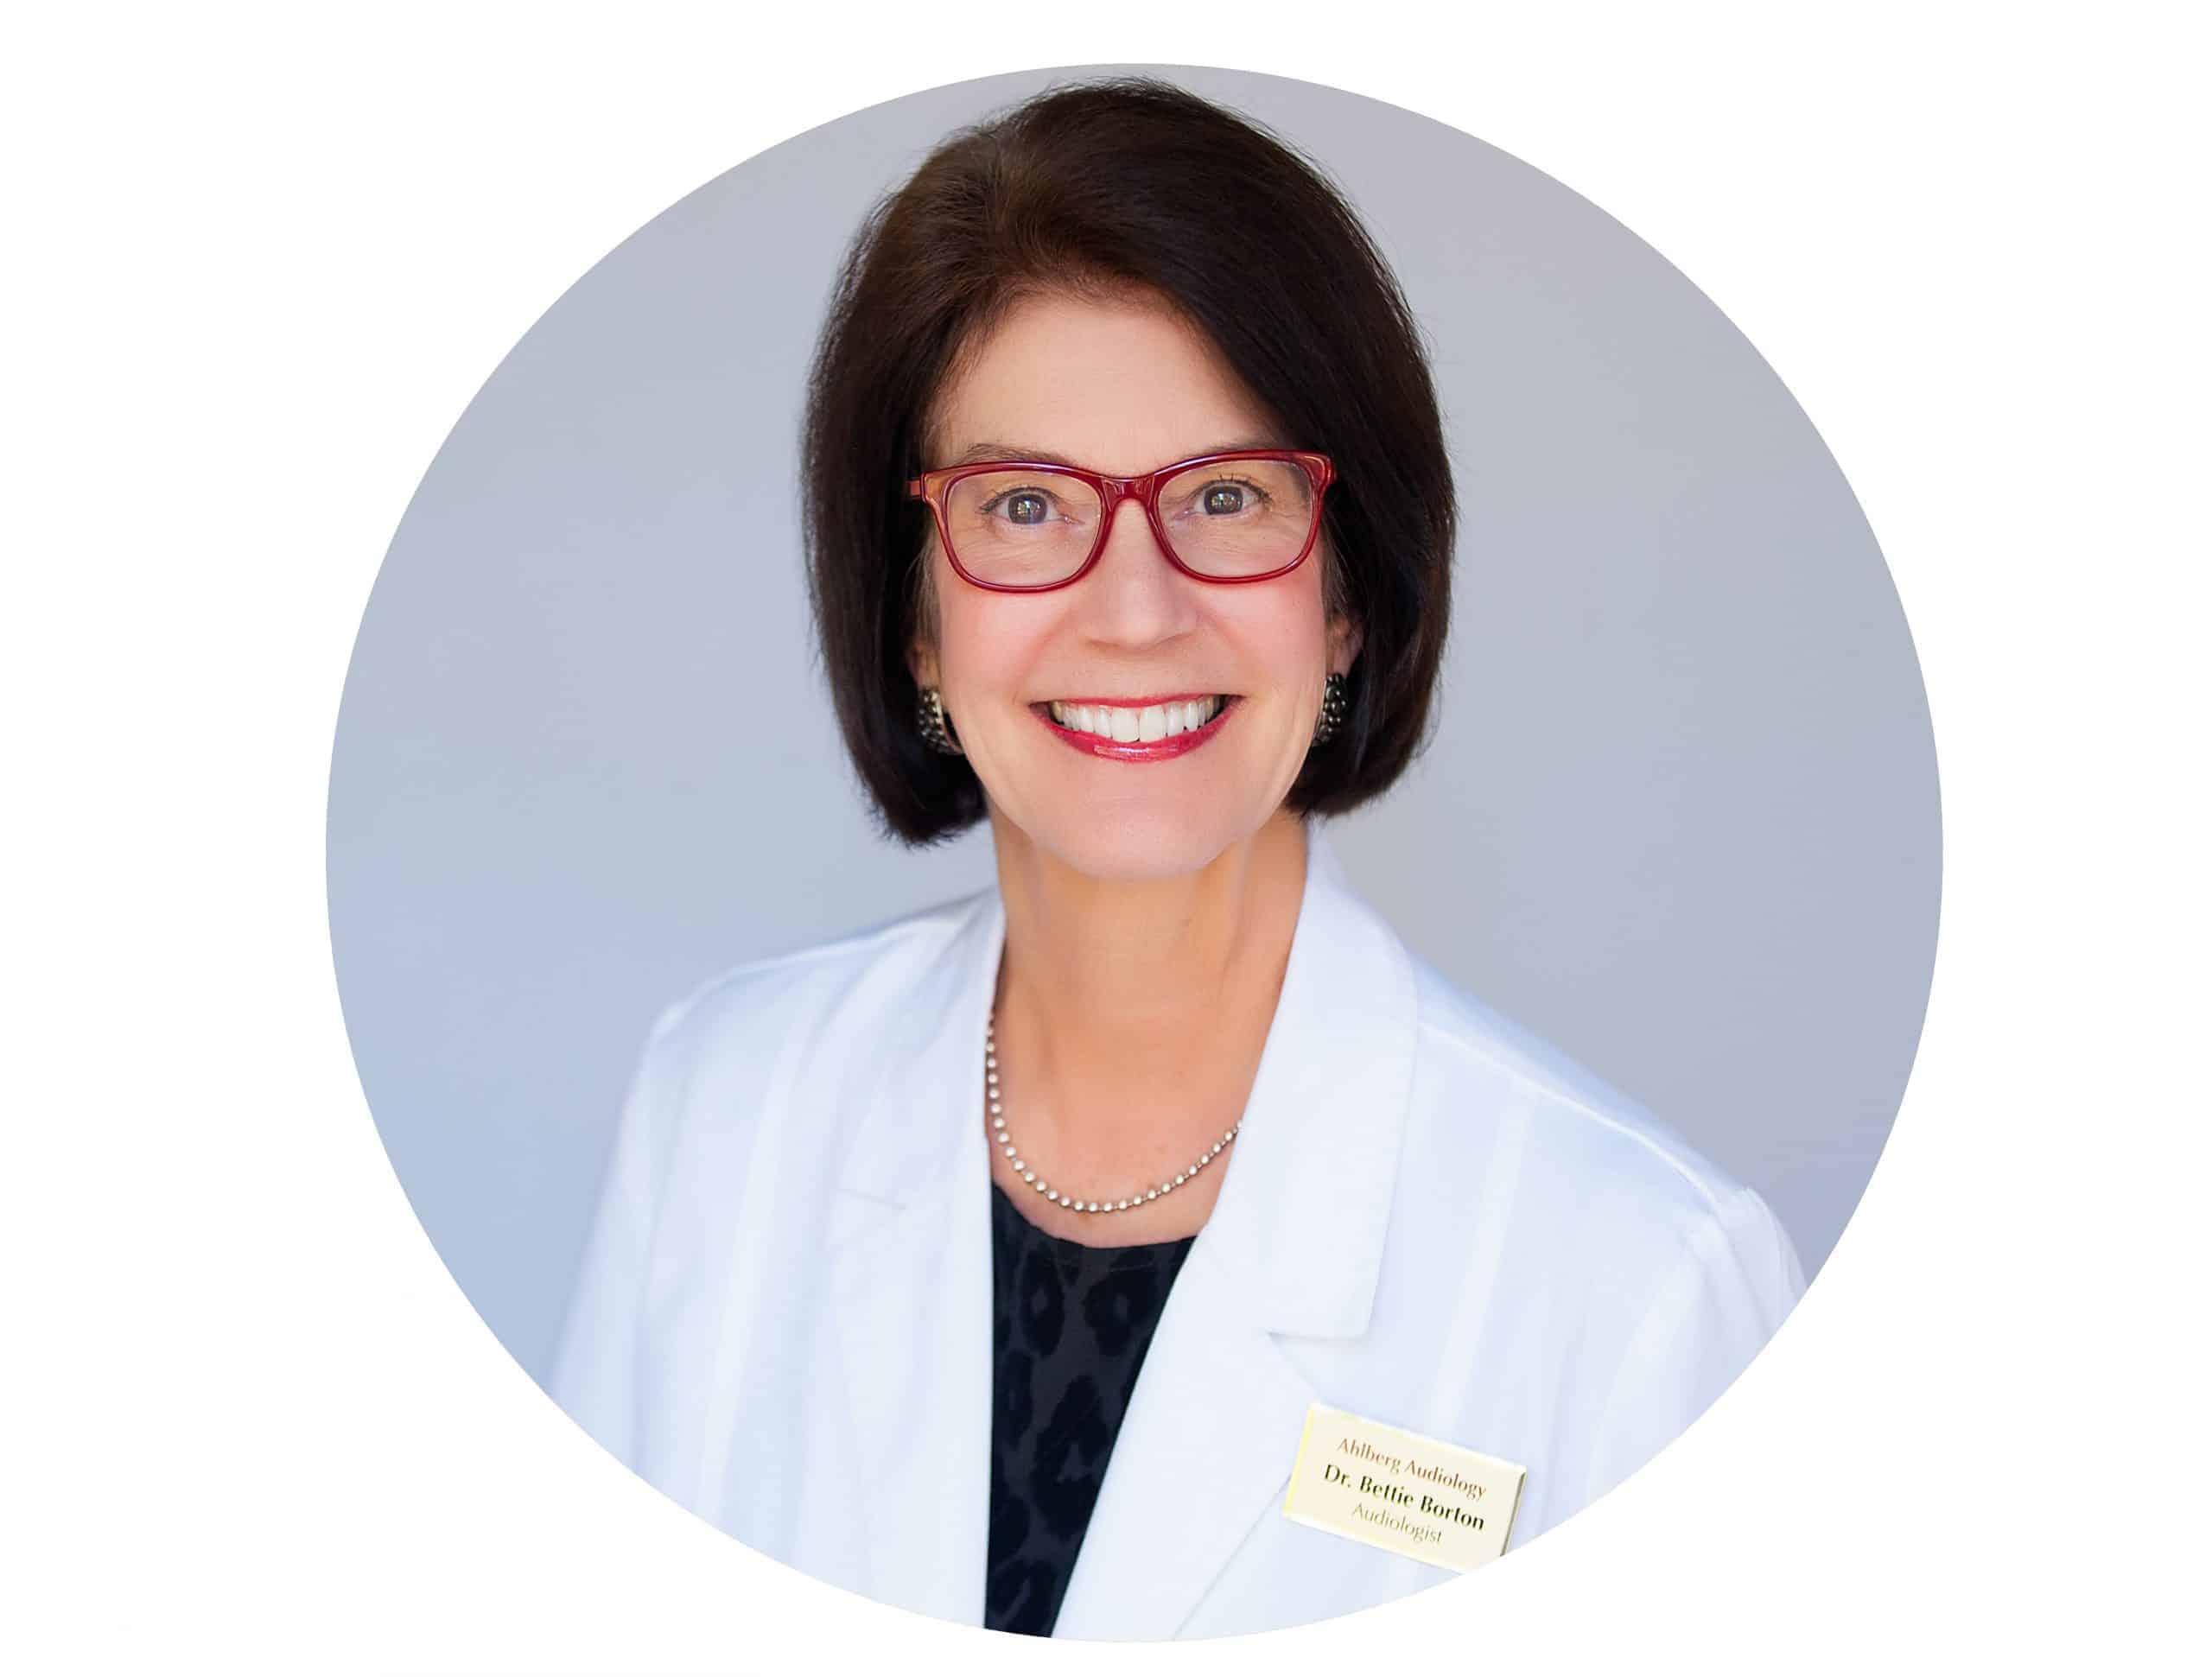 Dr. Bettie Borton, Audiologist